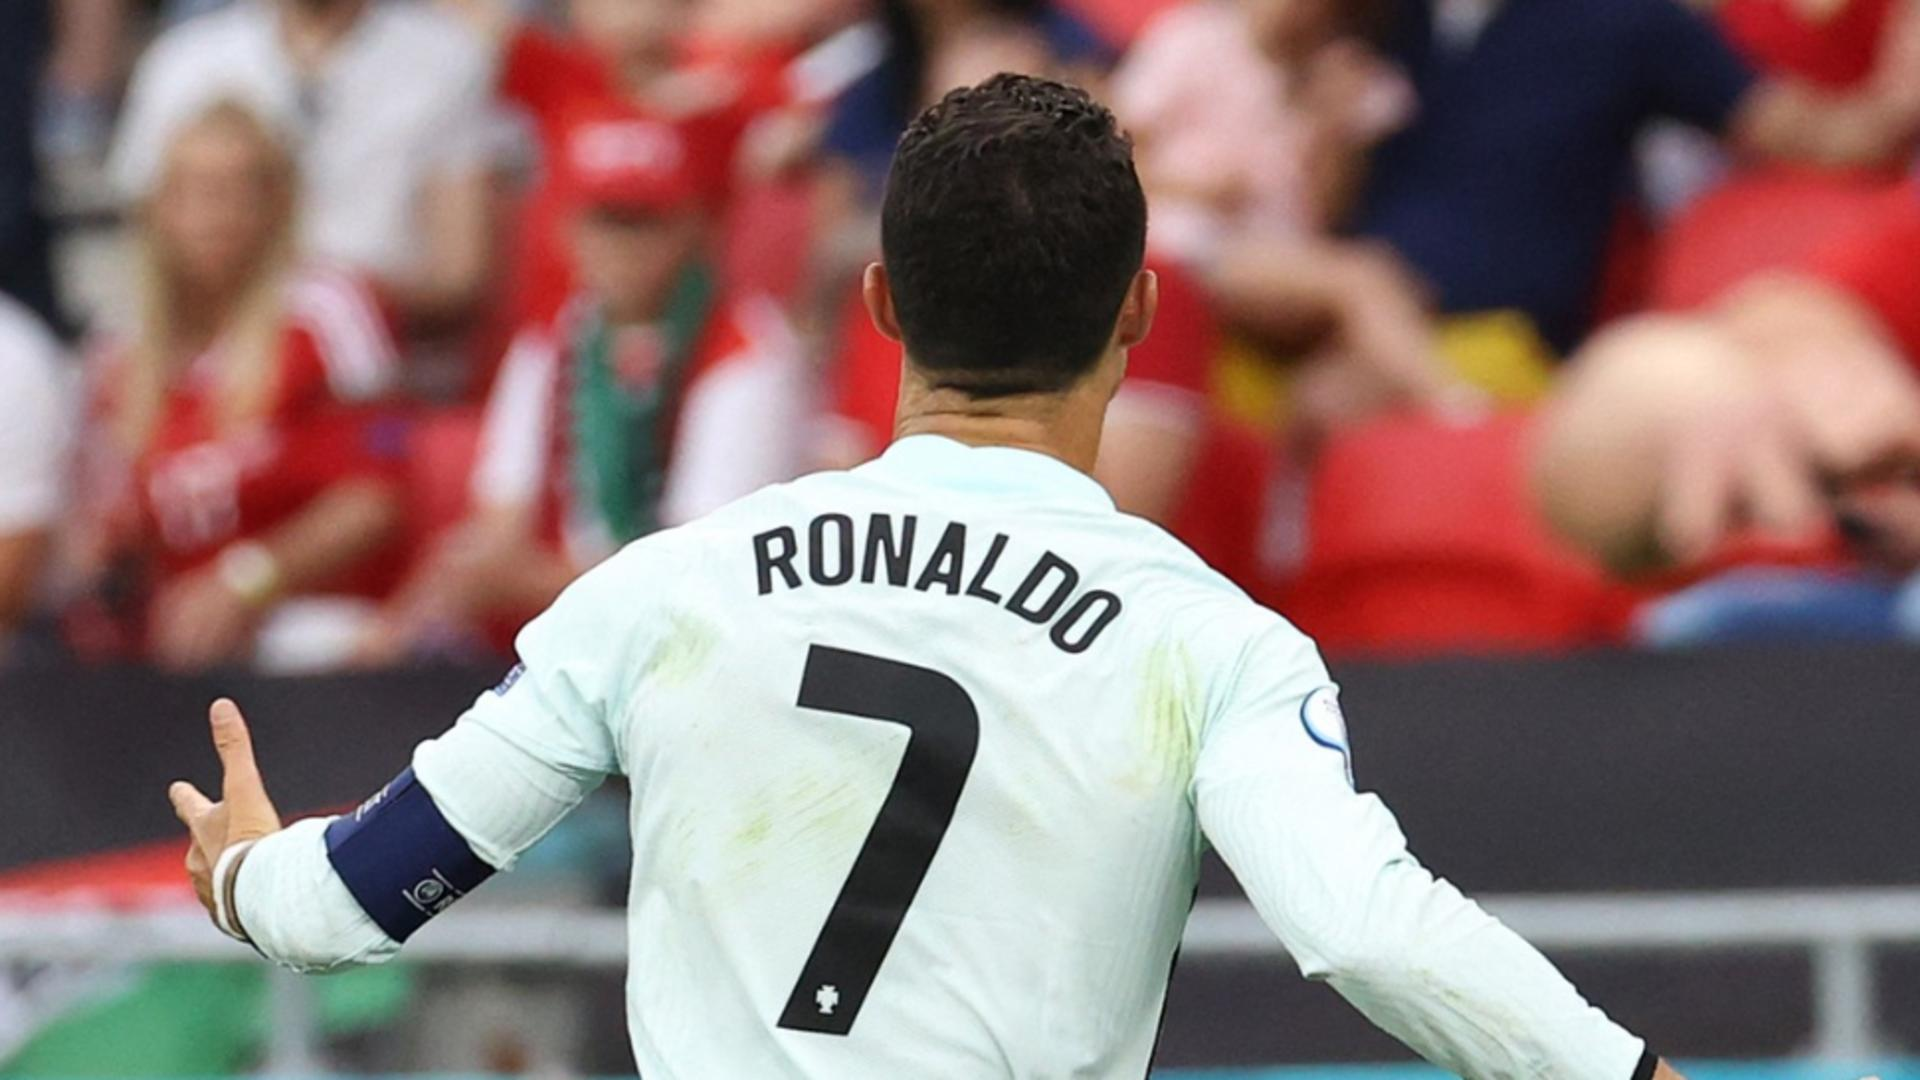 Cristiano Ronaldo, Sursa Foto: Profiemdia Images